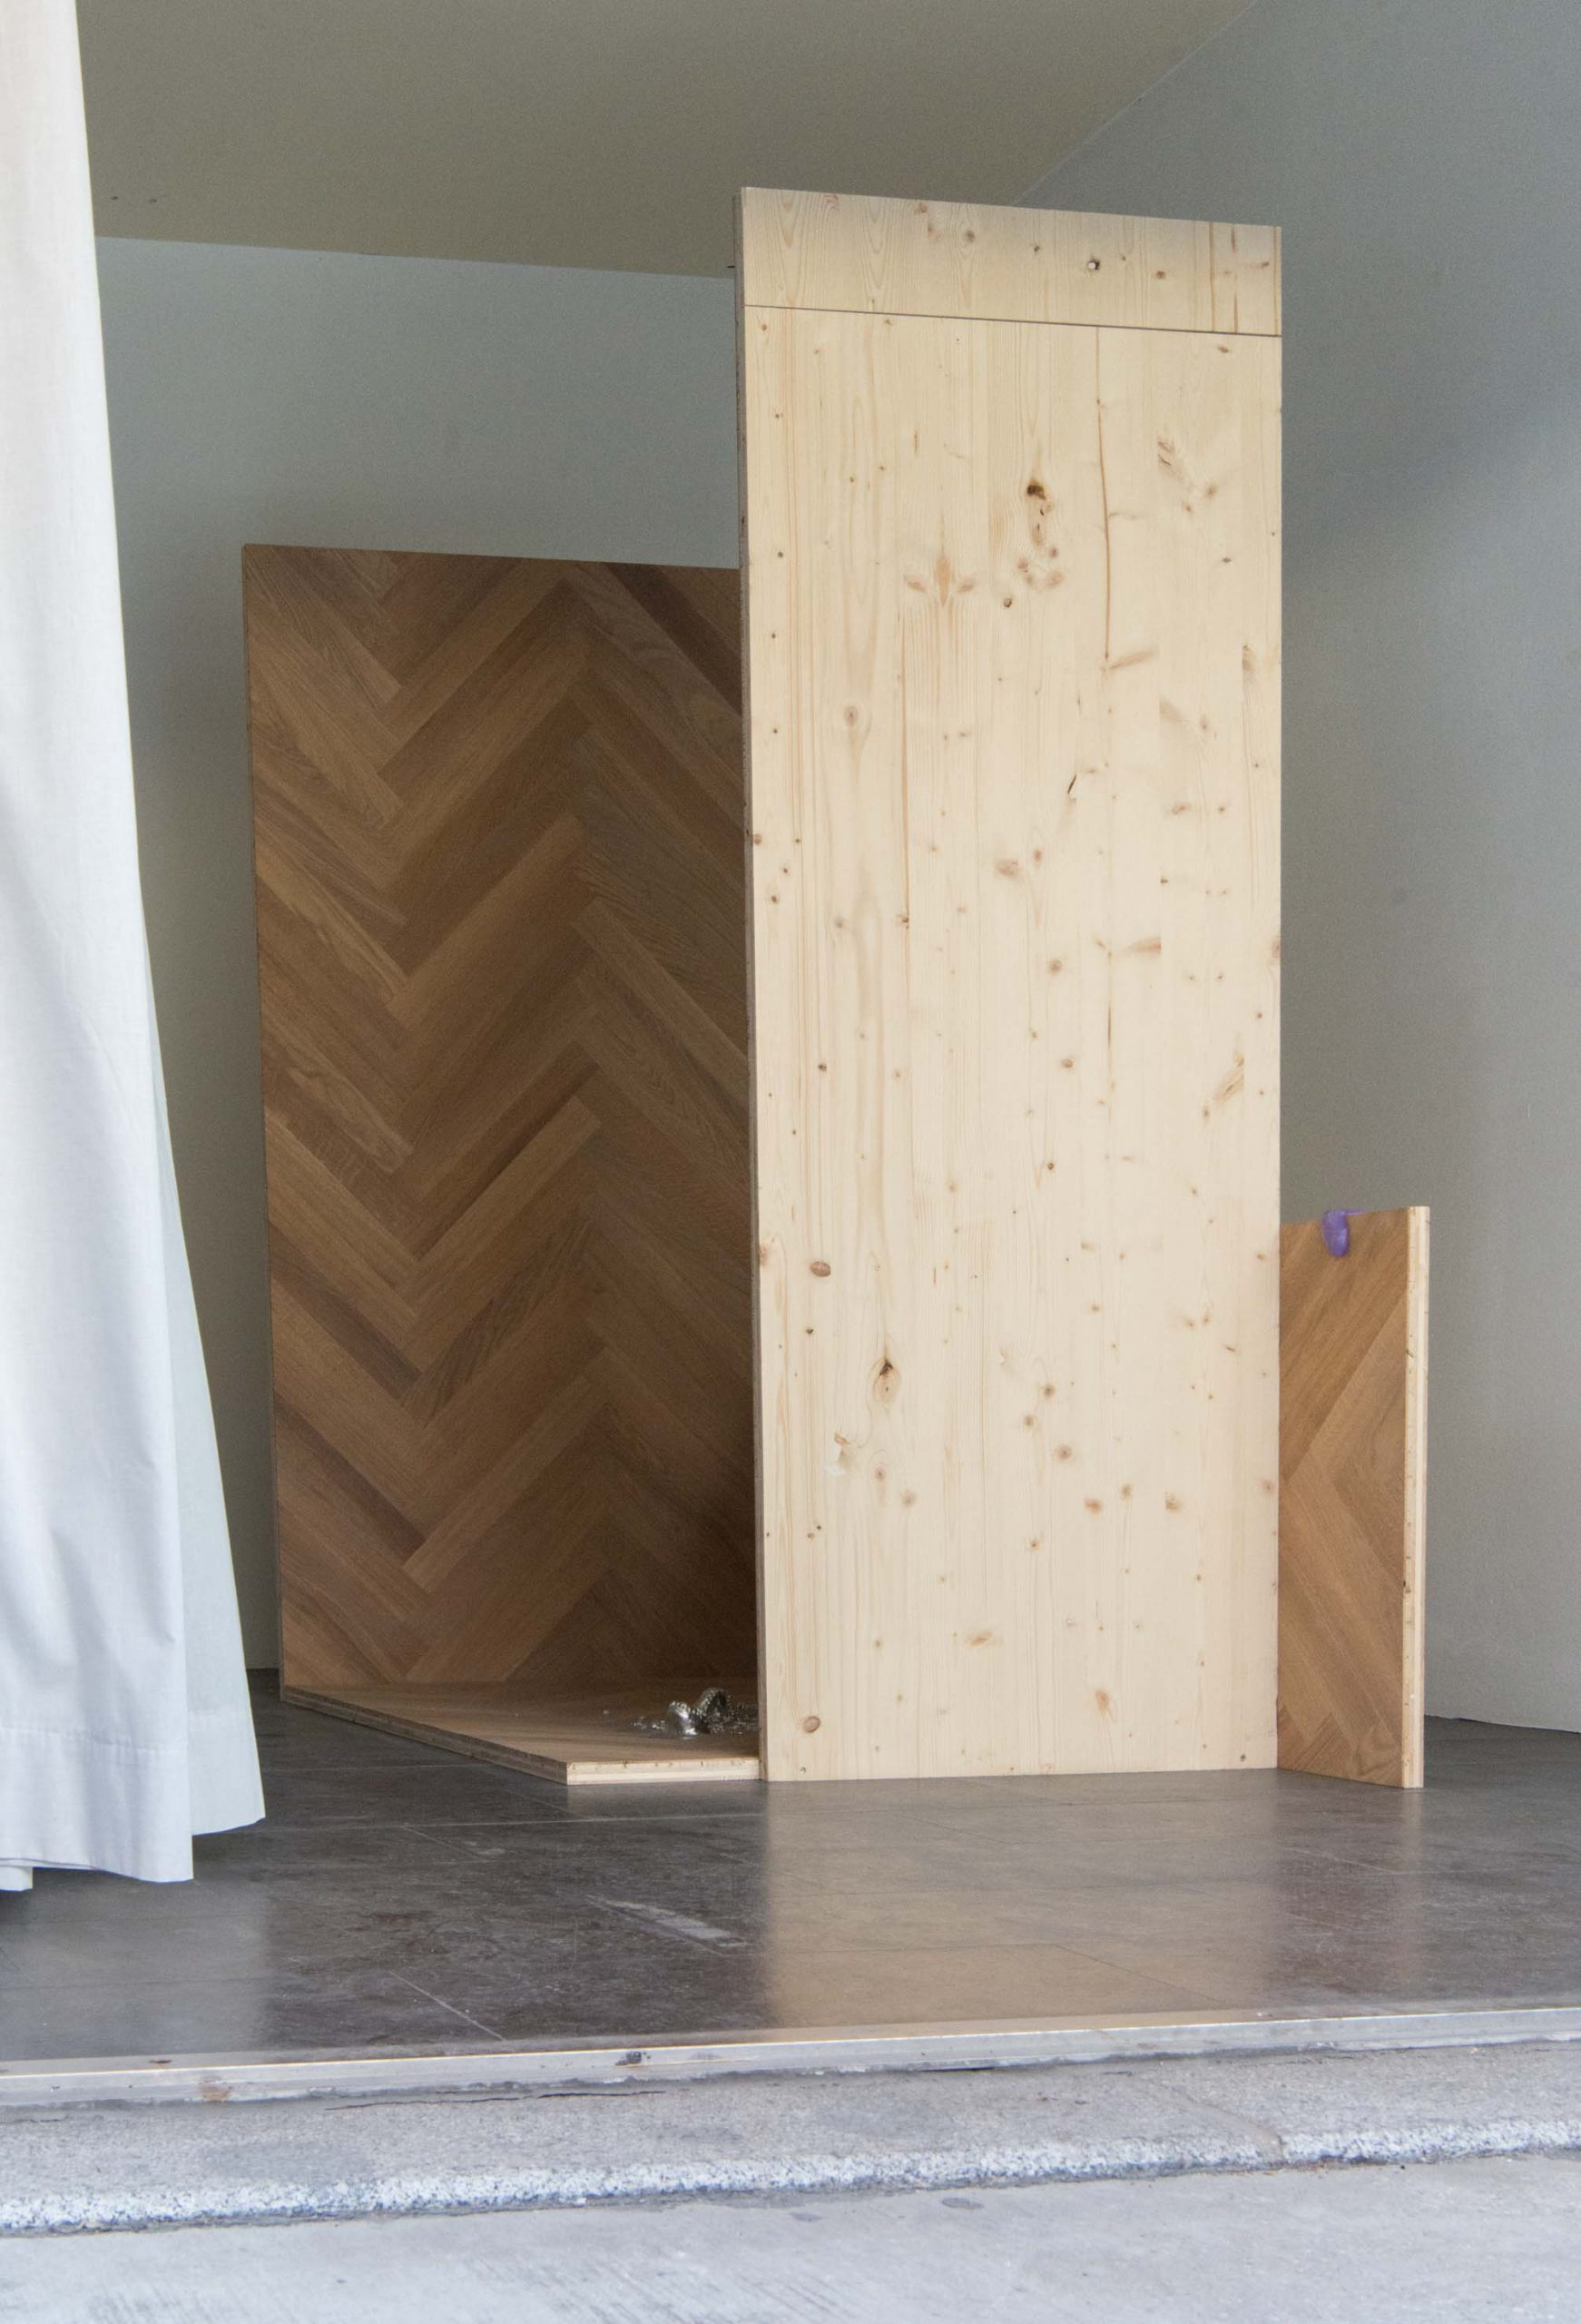 floor-work_Luka-Jana-Berchtold_2021_cSusanne-Reiterer-20